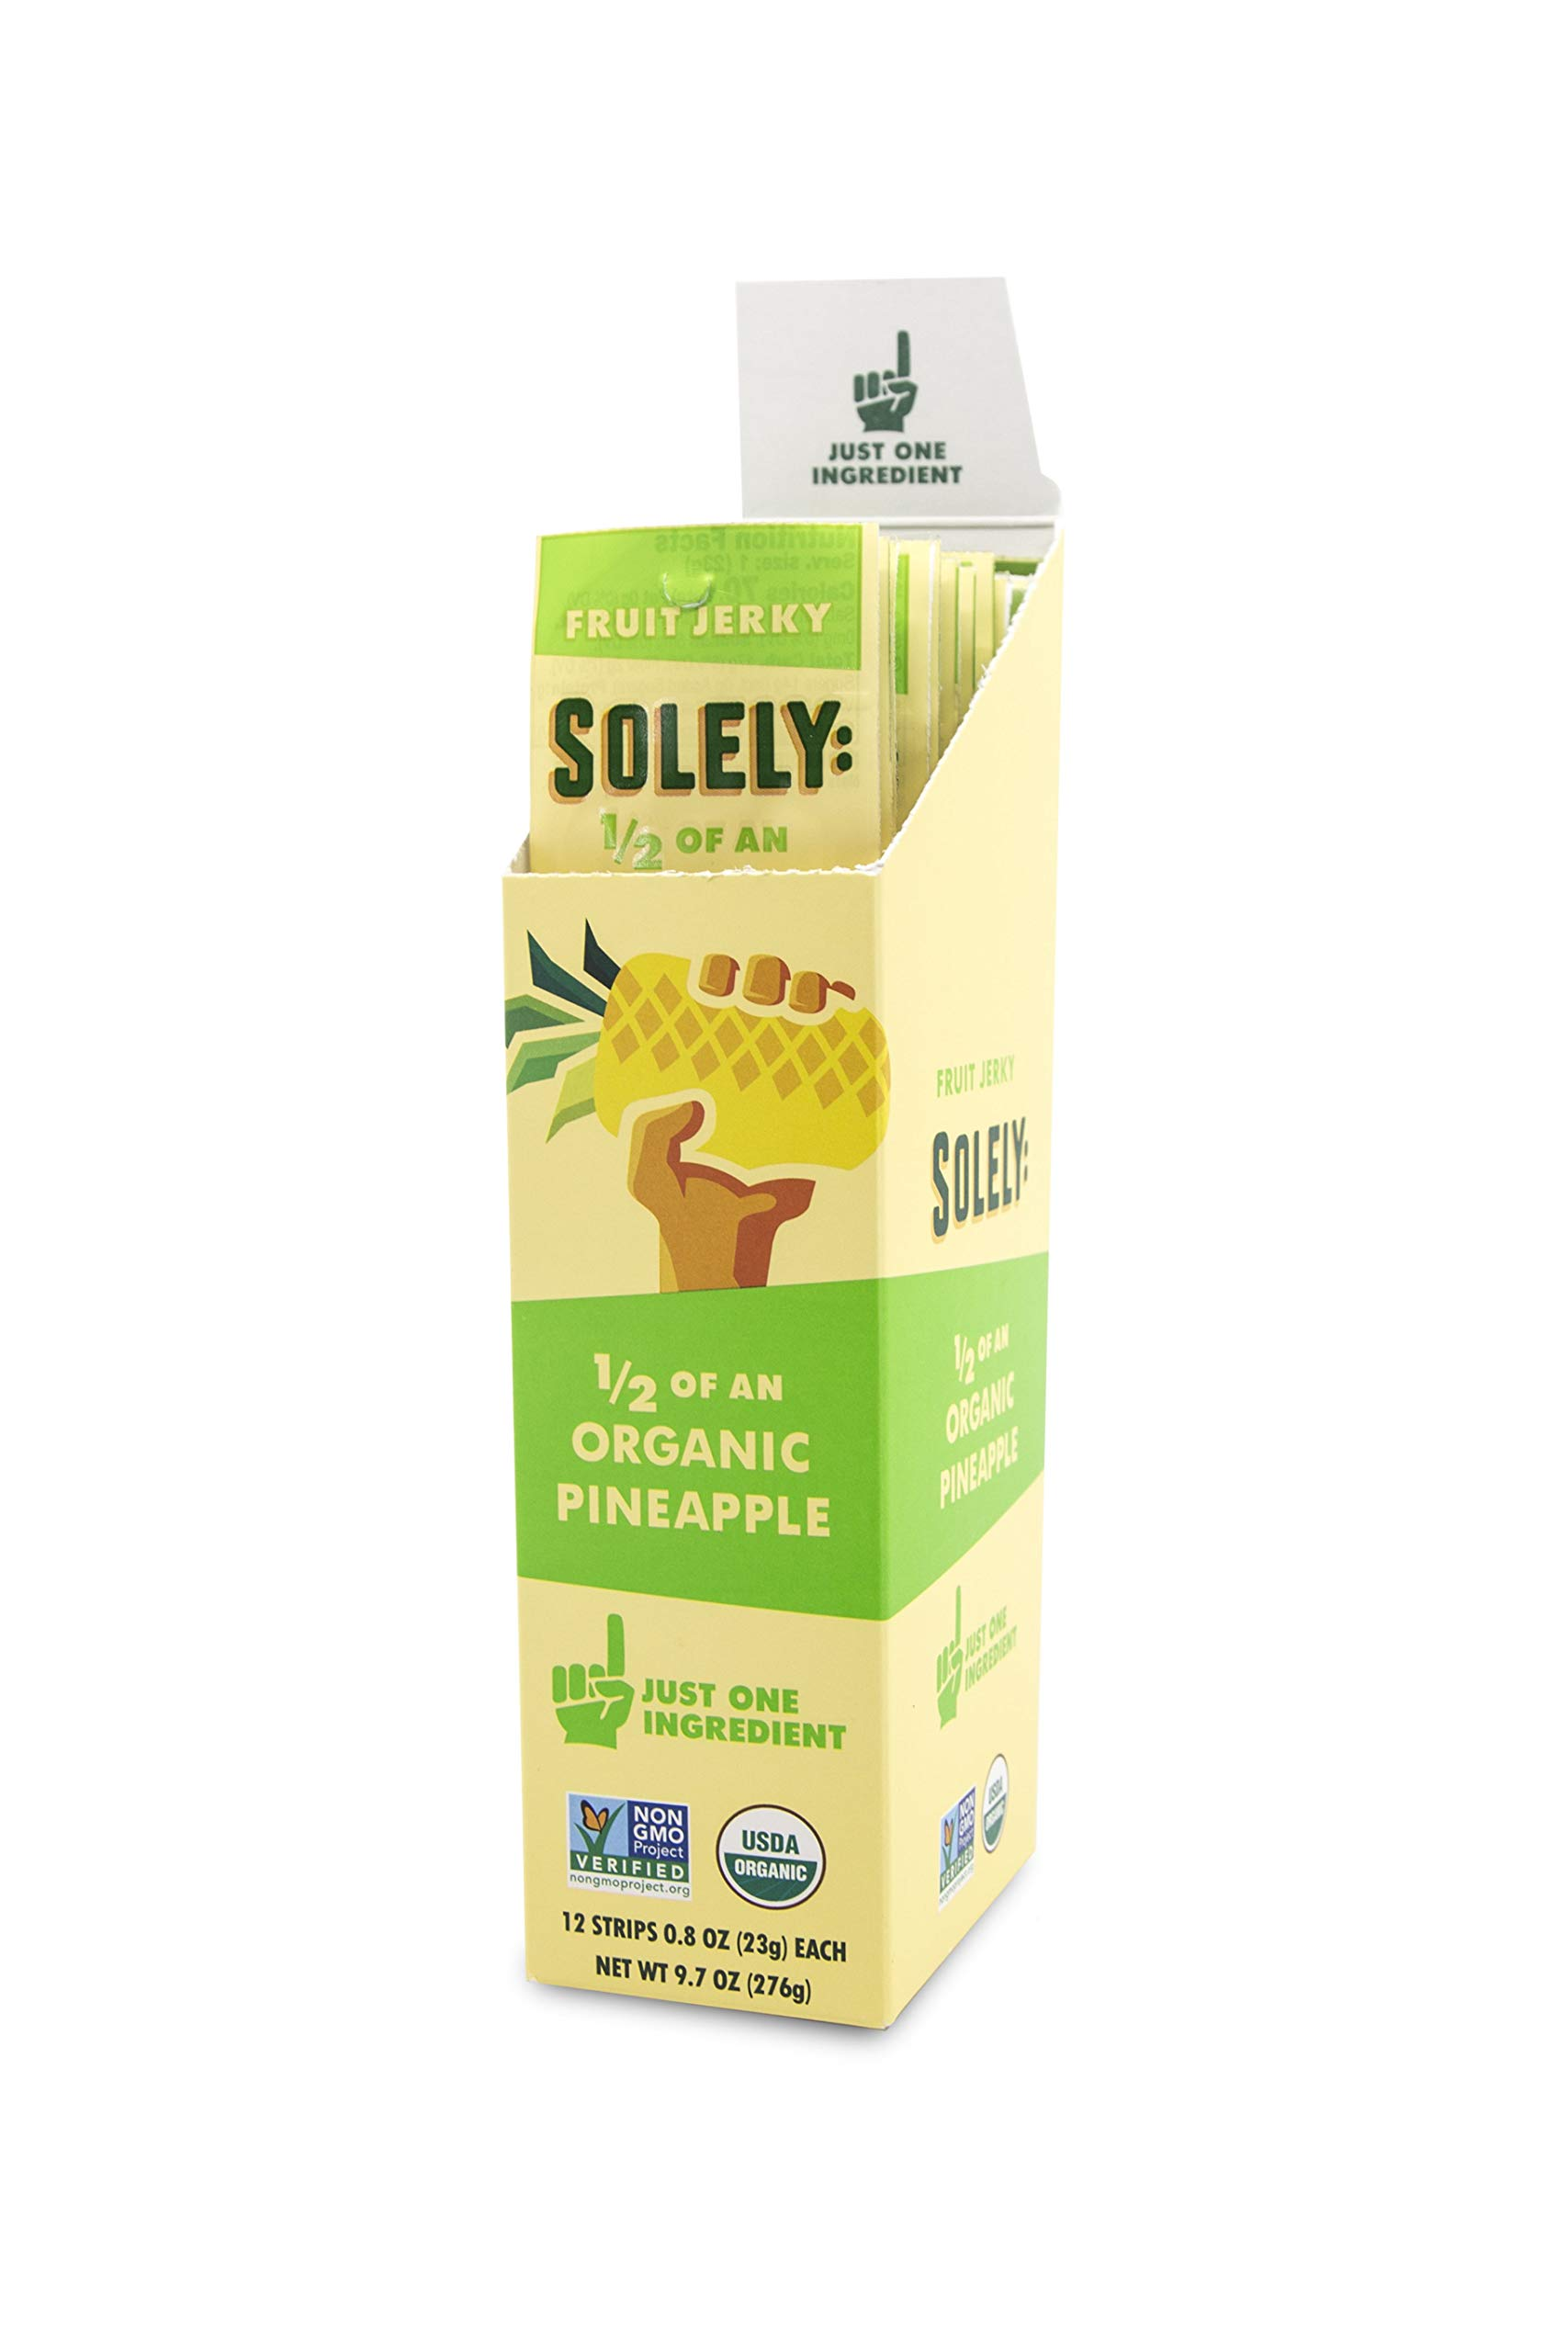 SOLELY Organic Pineapple Fruit Jerky, 12 Strips by SOLELY